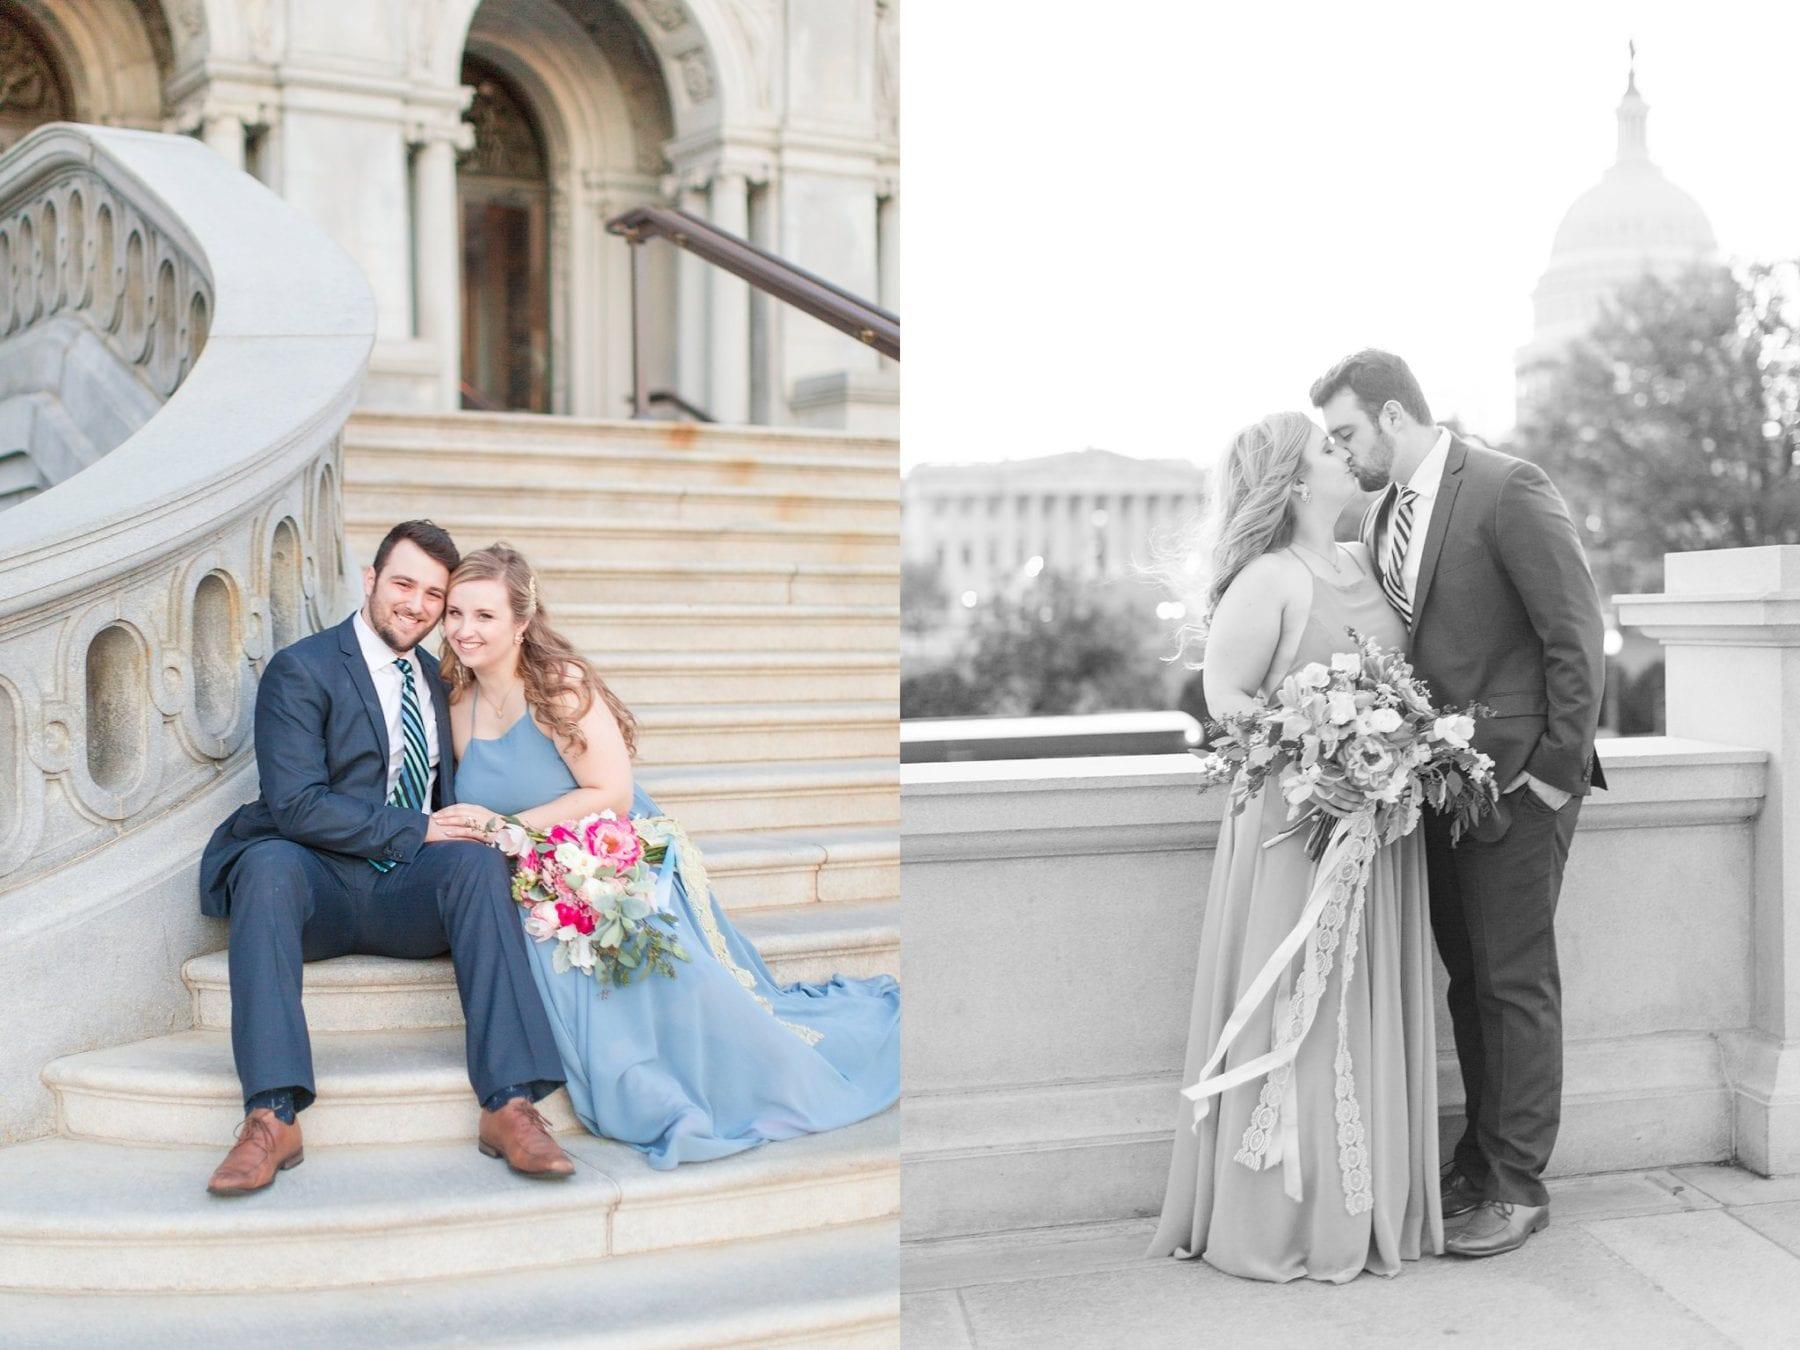 Capitol Hill Engagement Photos Kelly & Zach Washington DC Wedding Photographer Megan Kelsey Photography-354.jpg